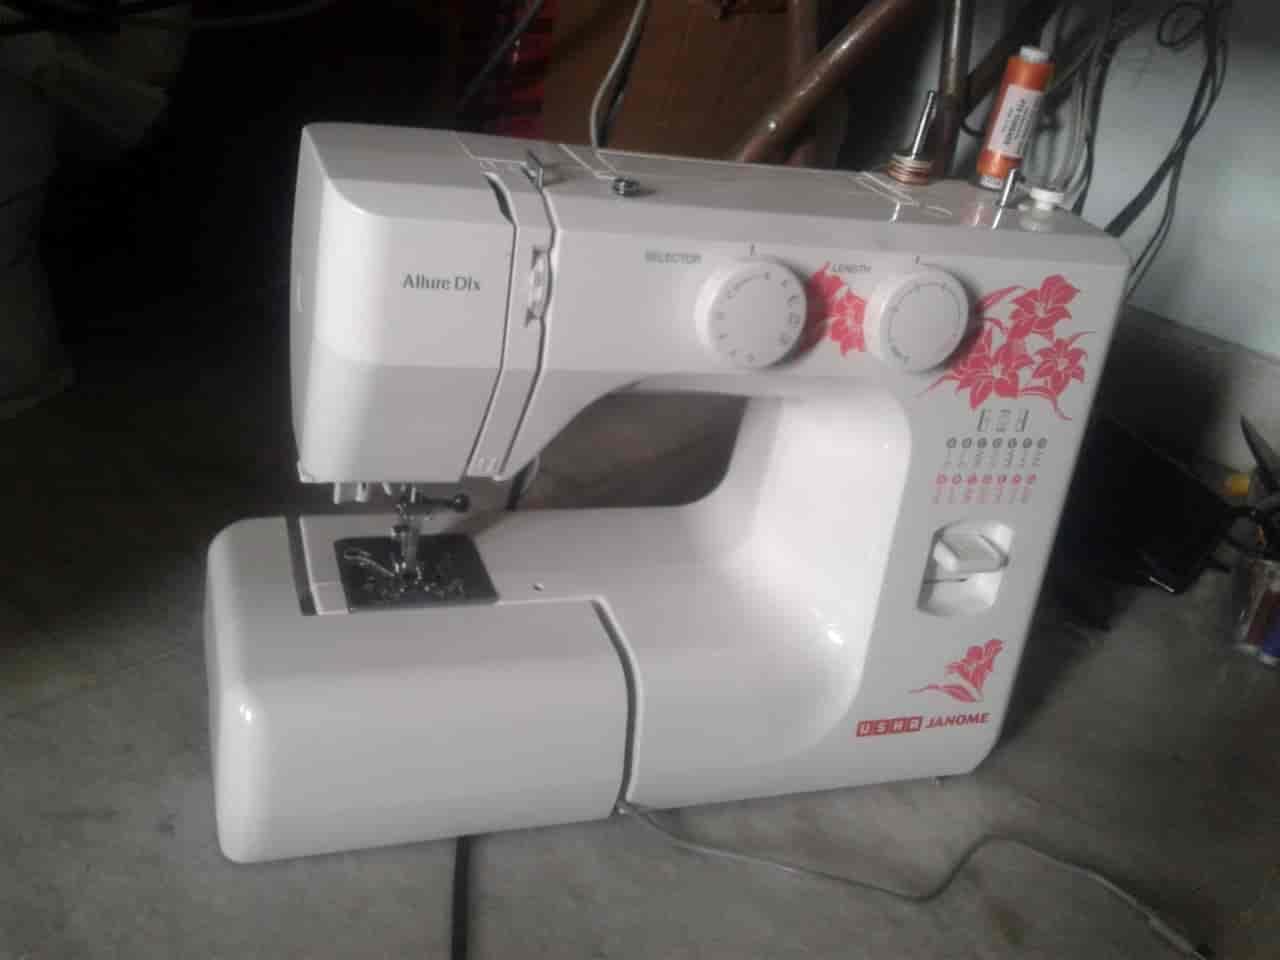 soma sewing machine services bhagya nagar colony kukatpally hyderabad sewing machine repair and services